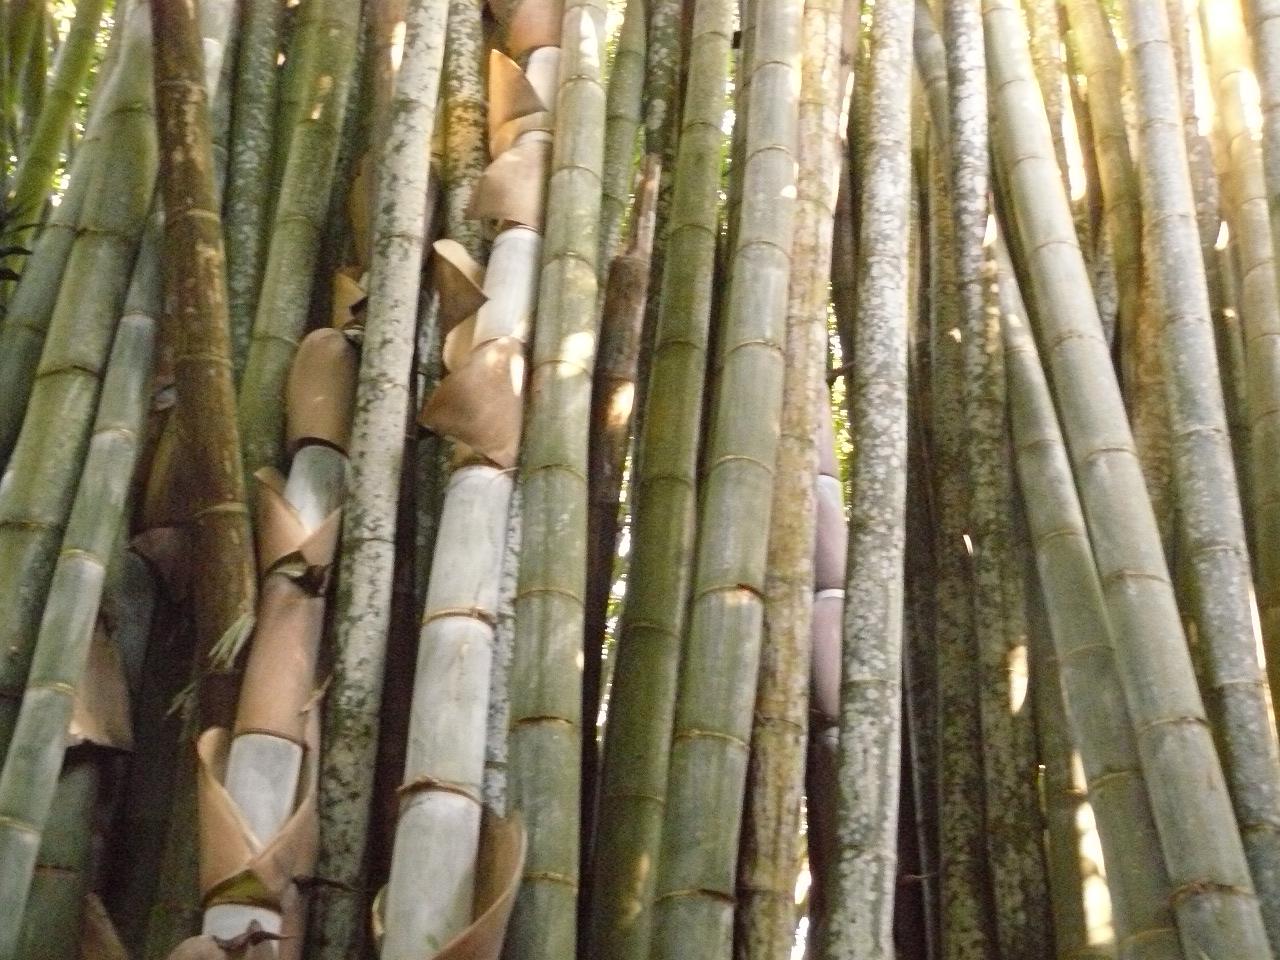 Mayotte_Combani_Bamboo_Géants_33